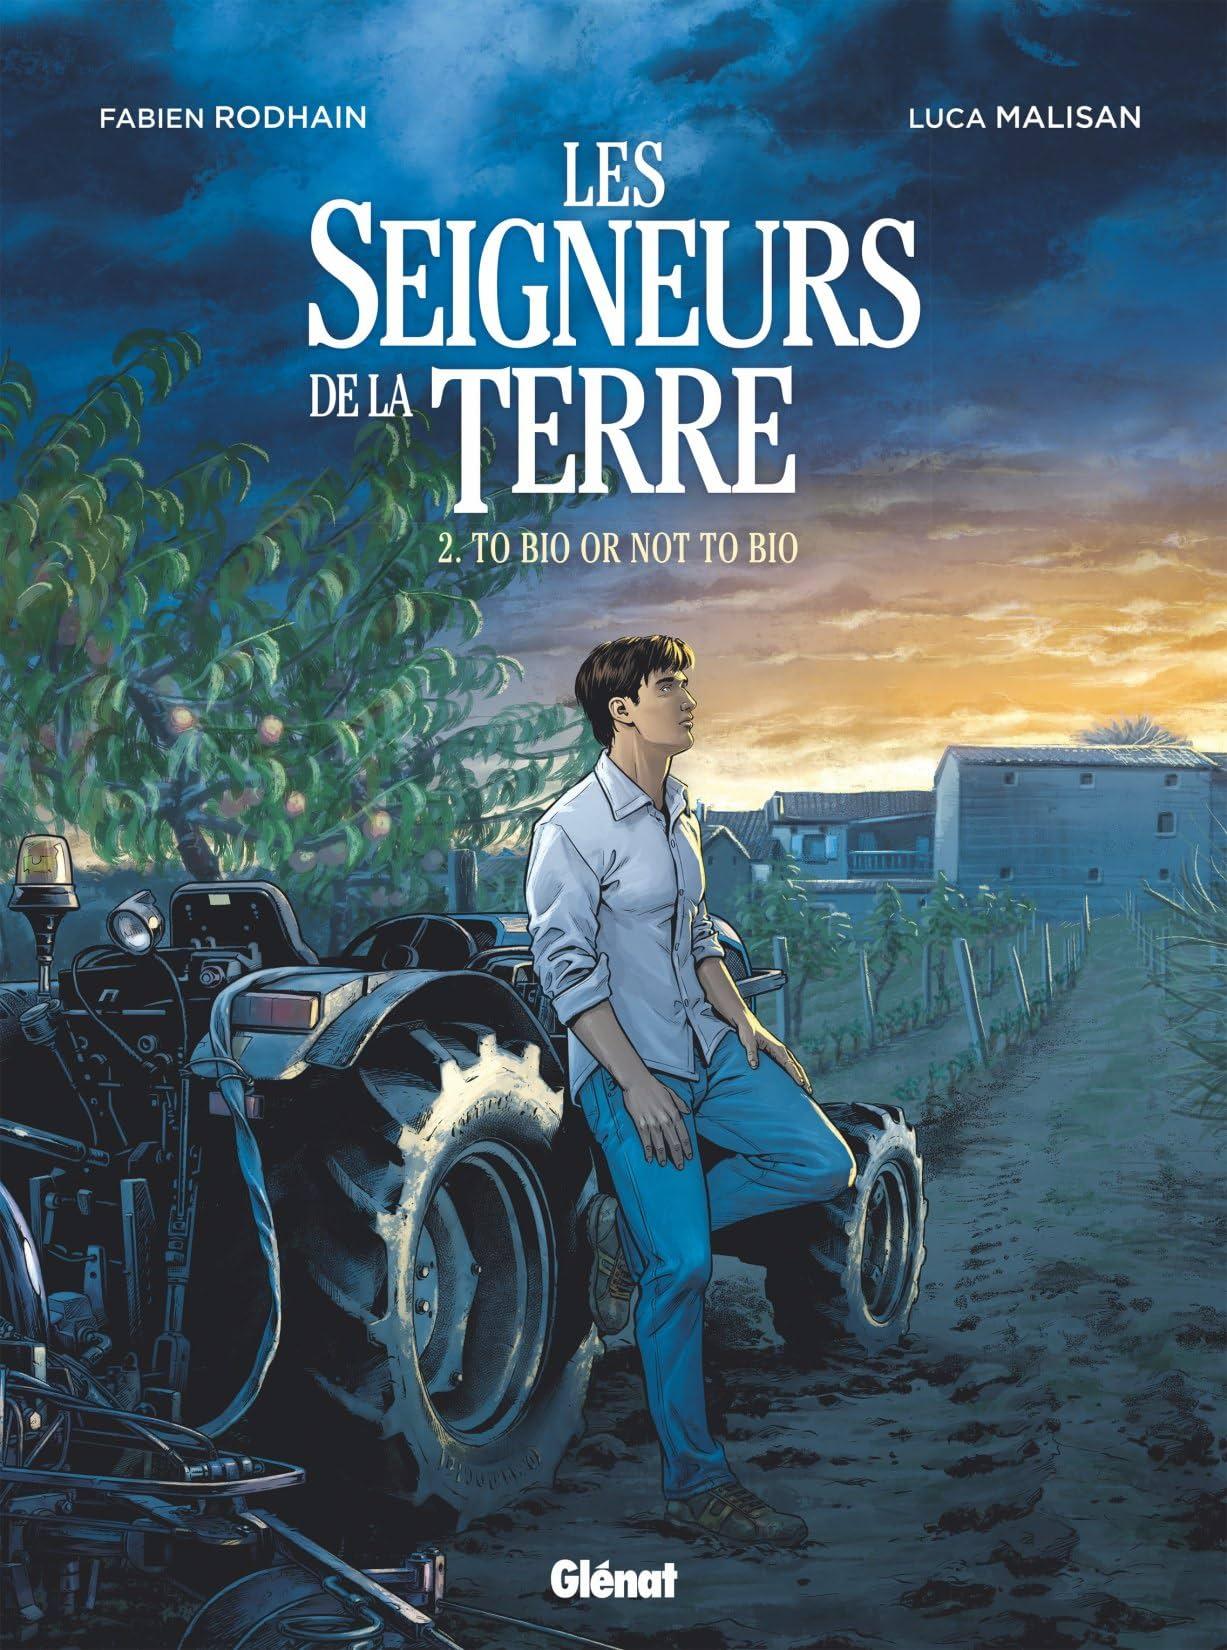 Les Seigneurs de la terre Vol. 2: To bio or not to bio